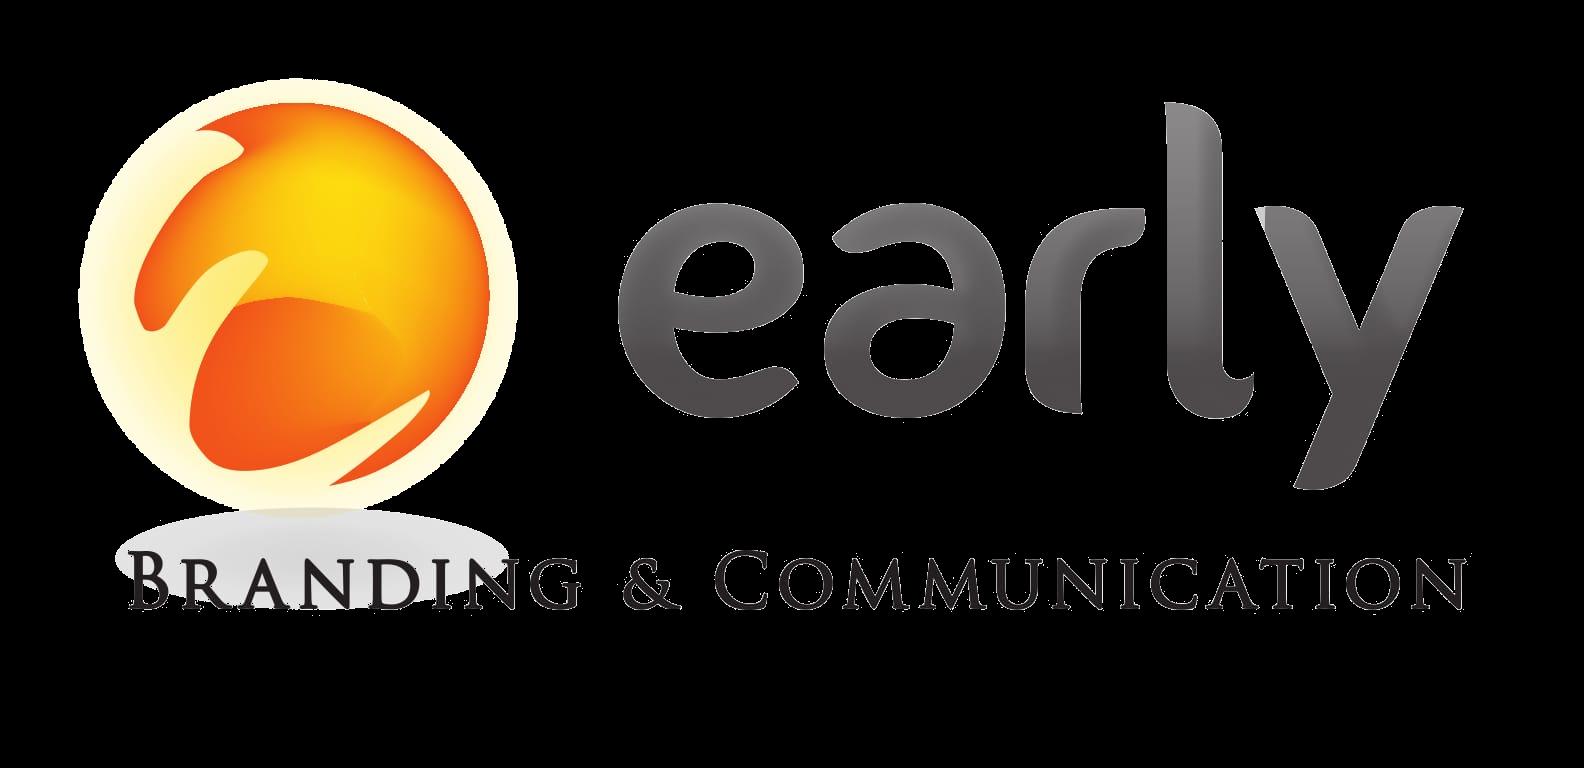 early branding & communication